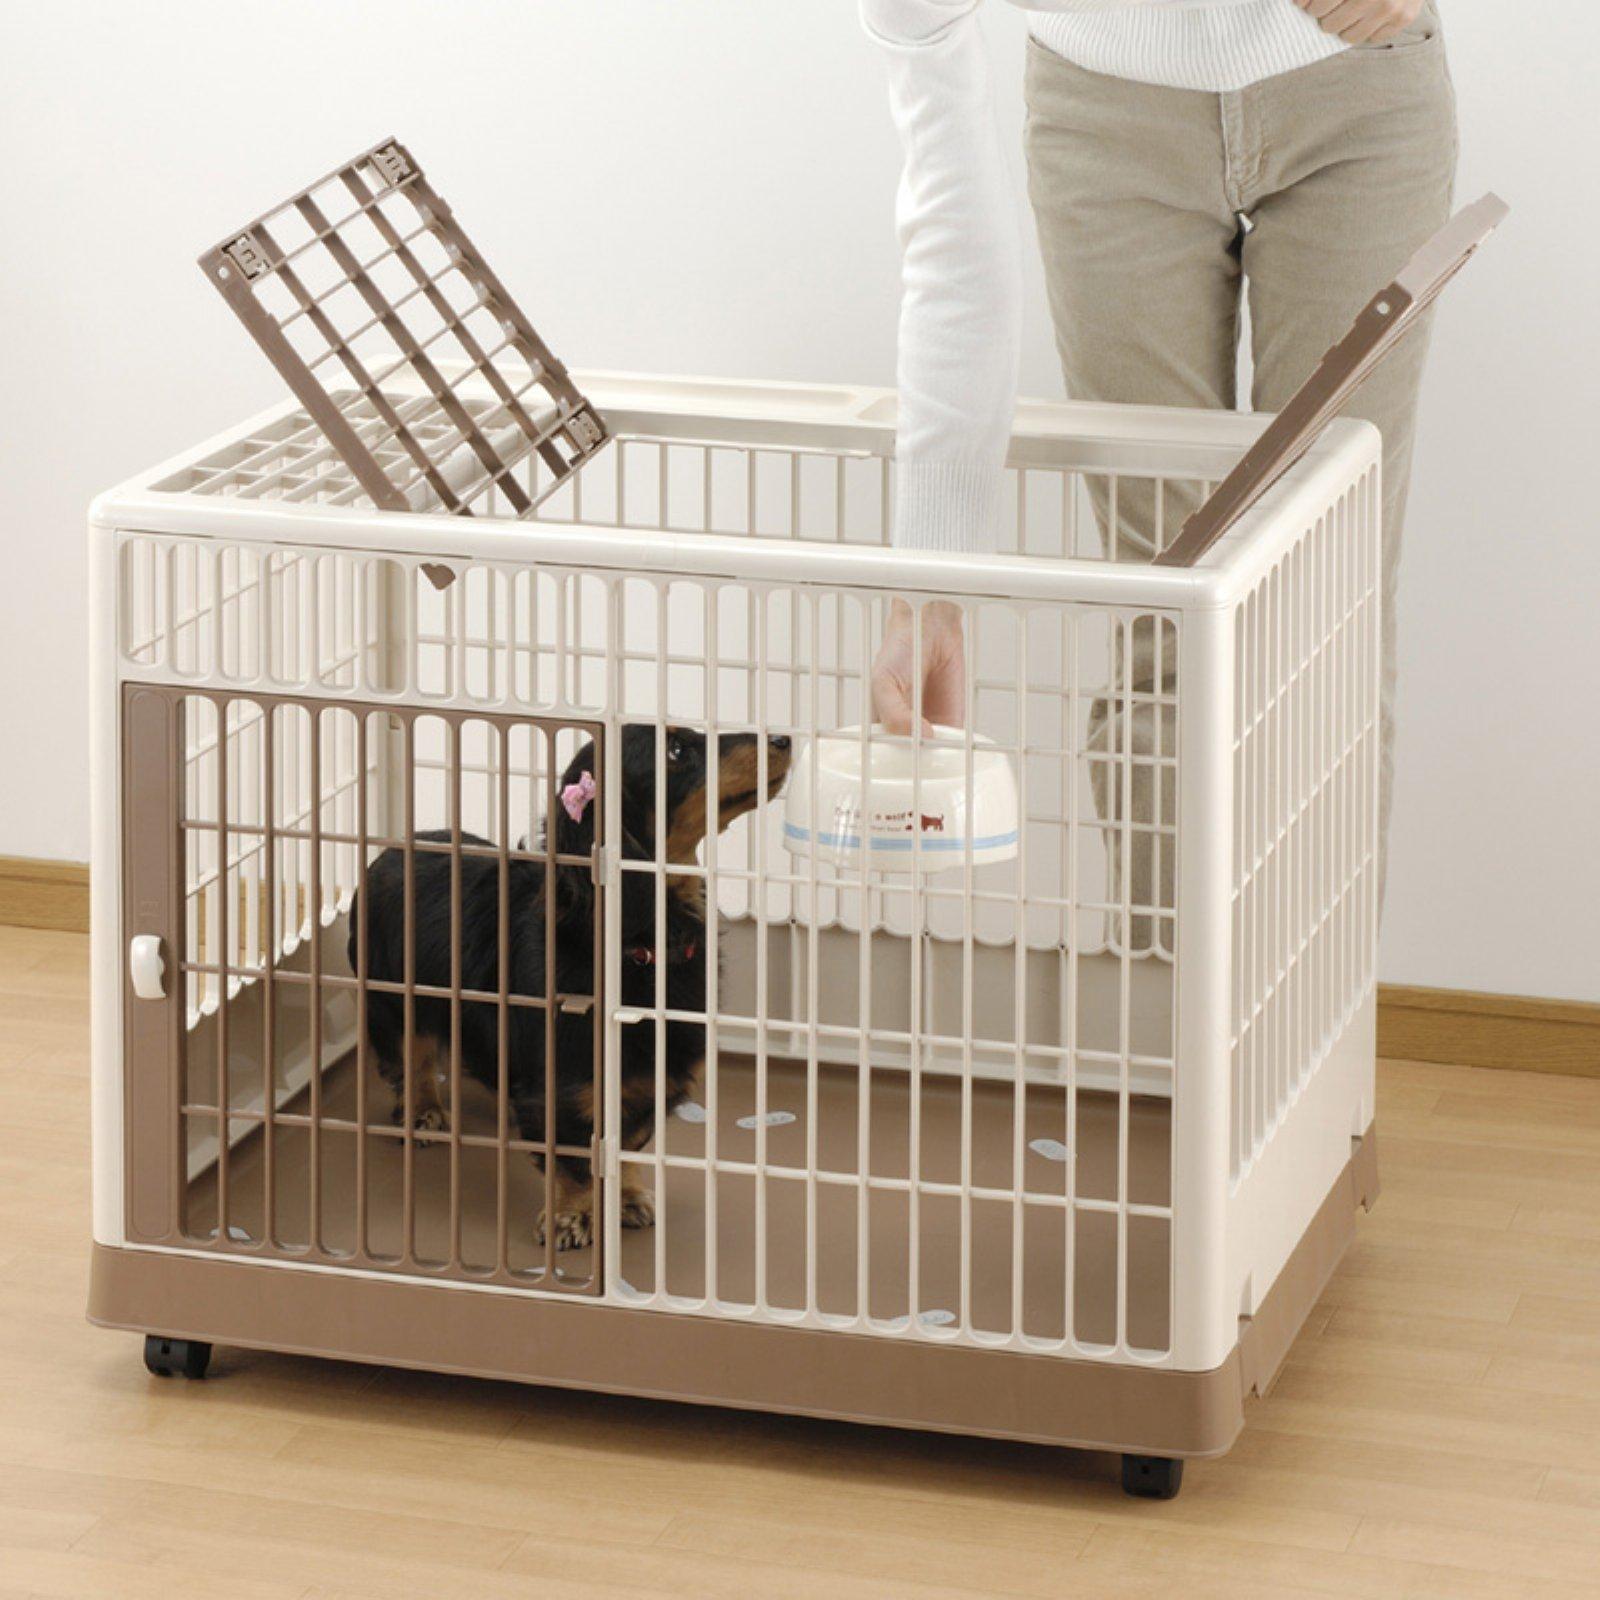 "Richell Pet Training Kennel PK-830, White/Mocha, 32.5"" x 21.7"" x 24.6"""